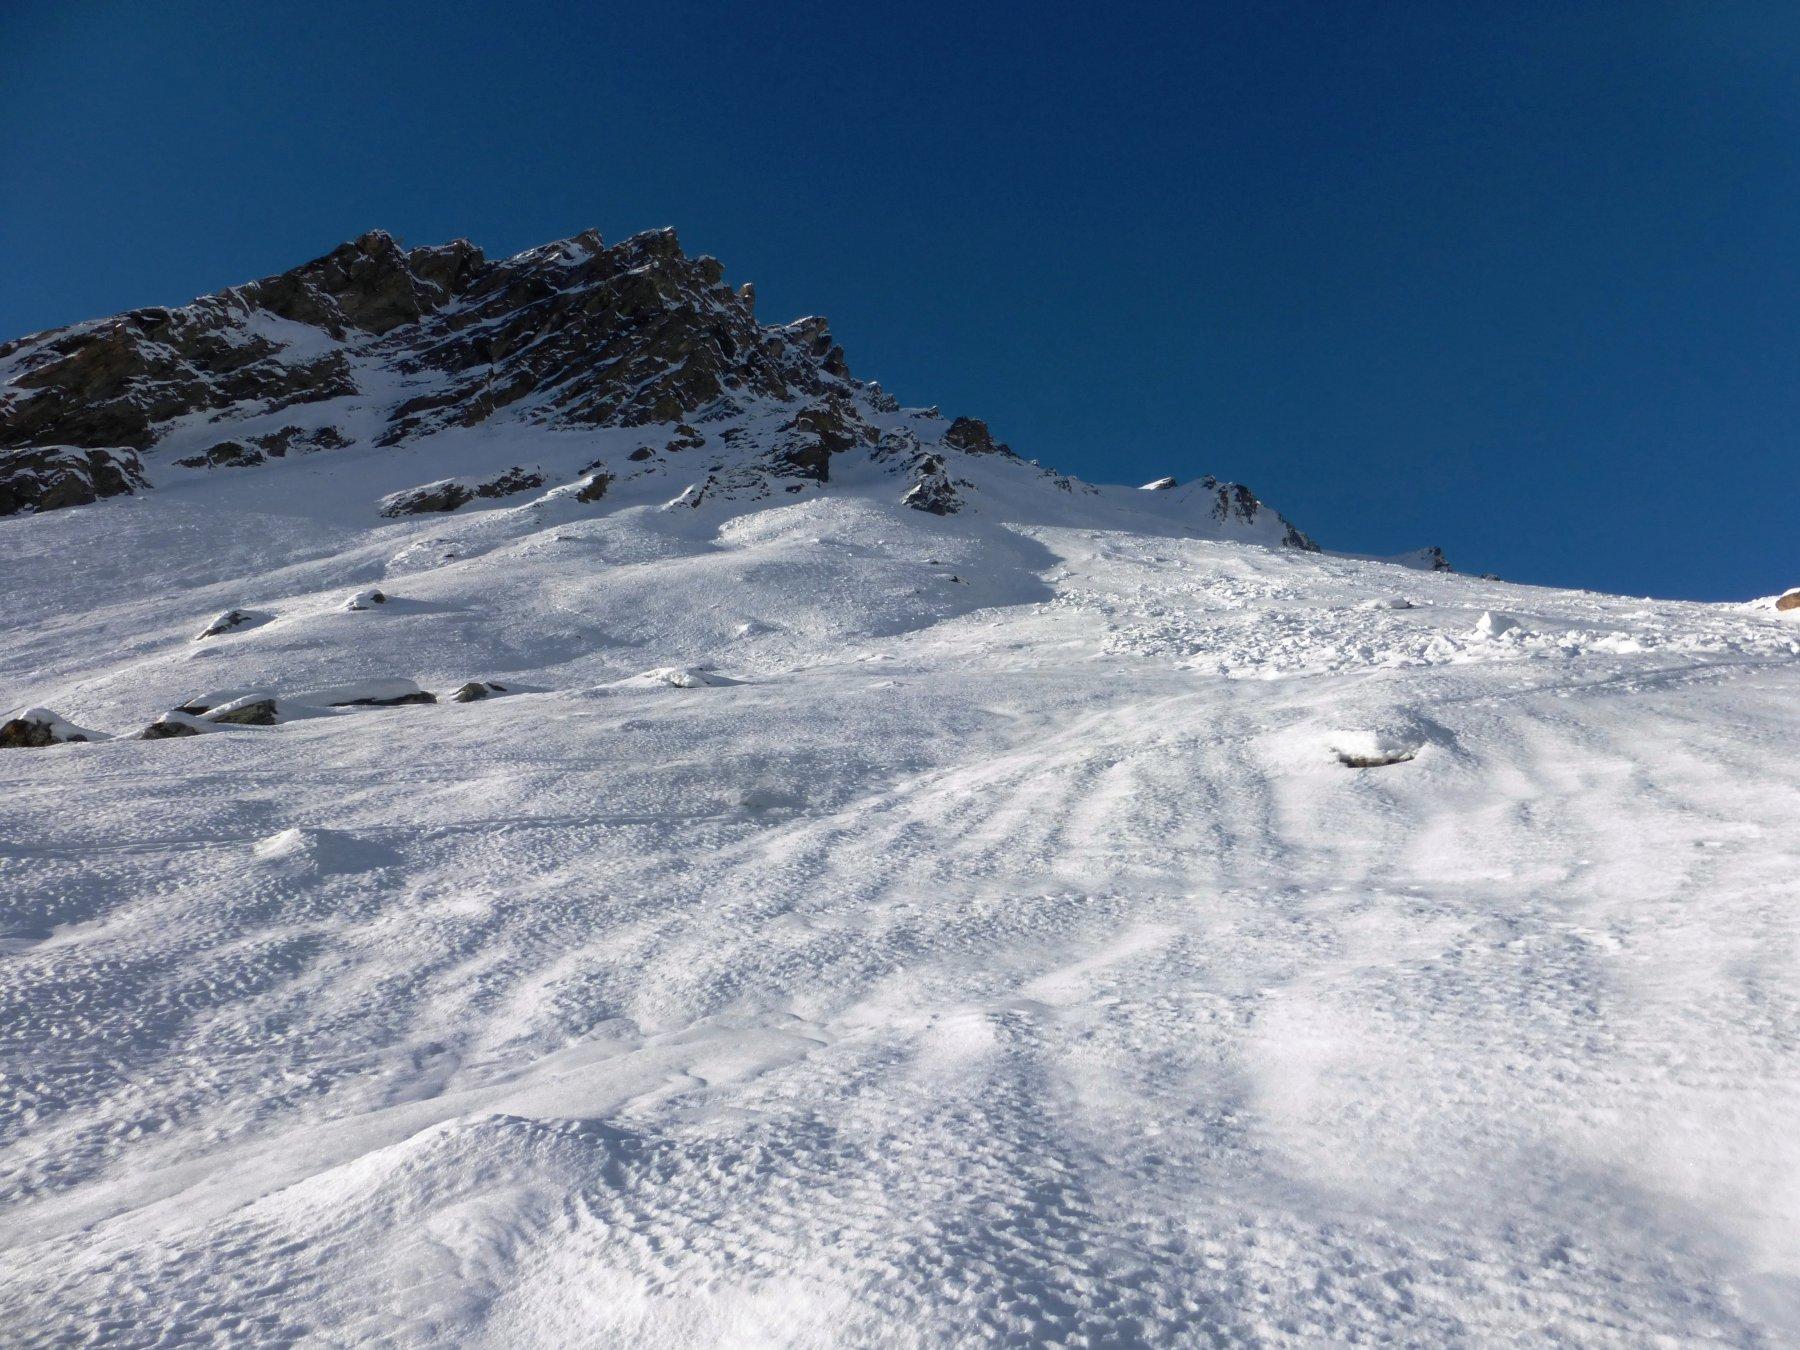 traversi su neve dura